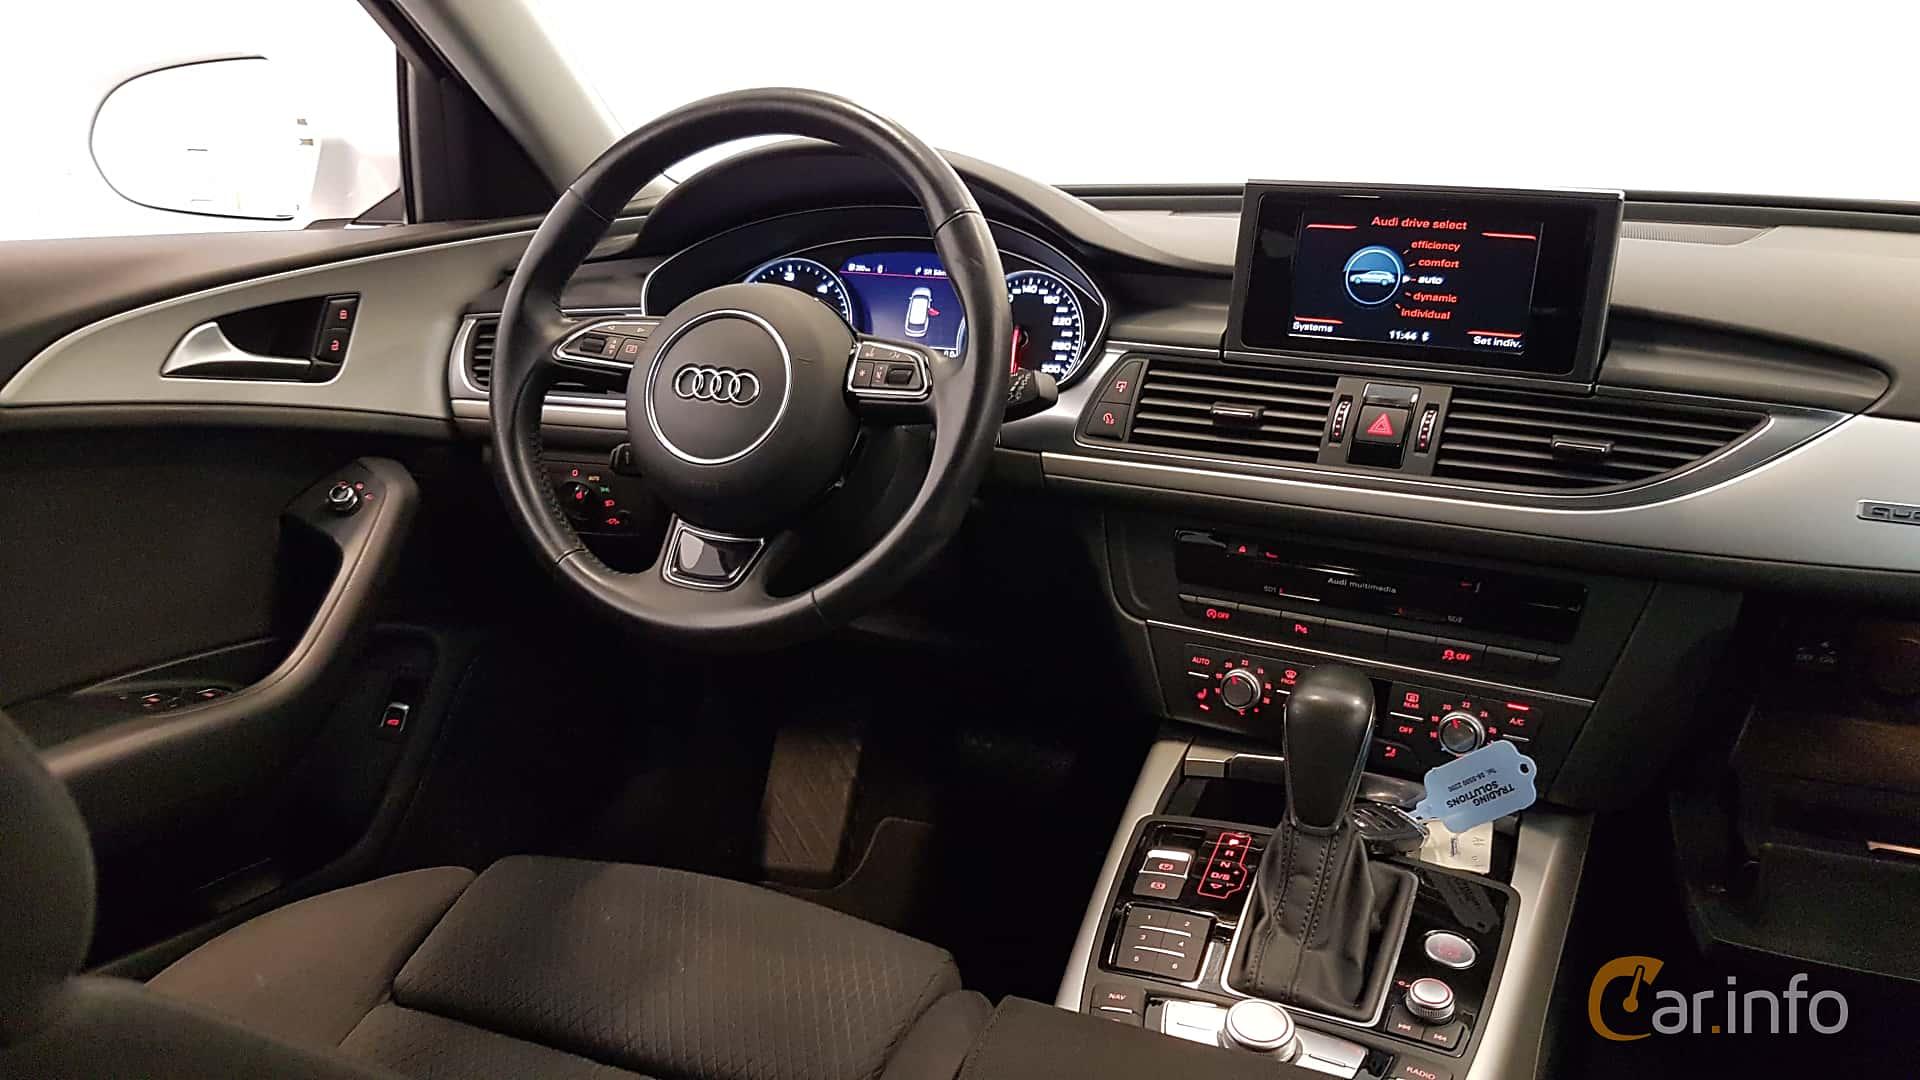 Audi A6 Avant 2.0 TDI quattro S Tronic, 190hp, 2016